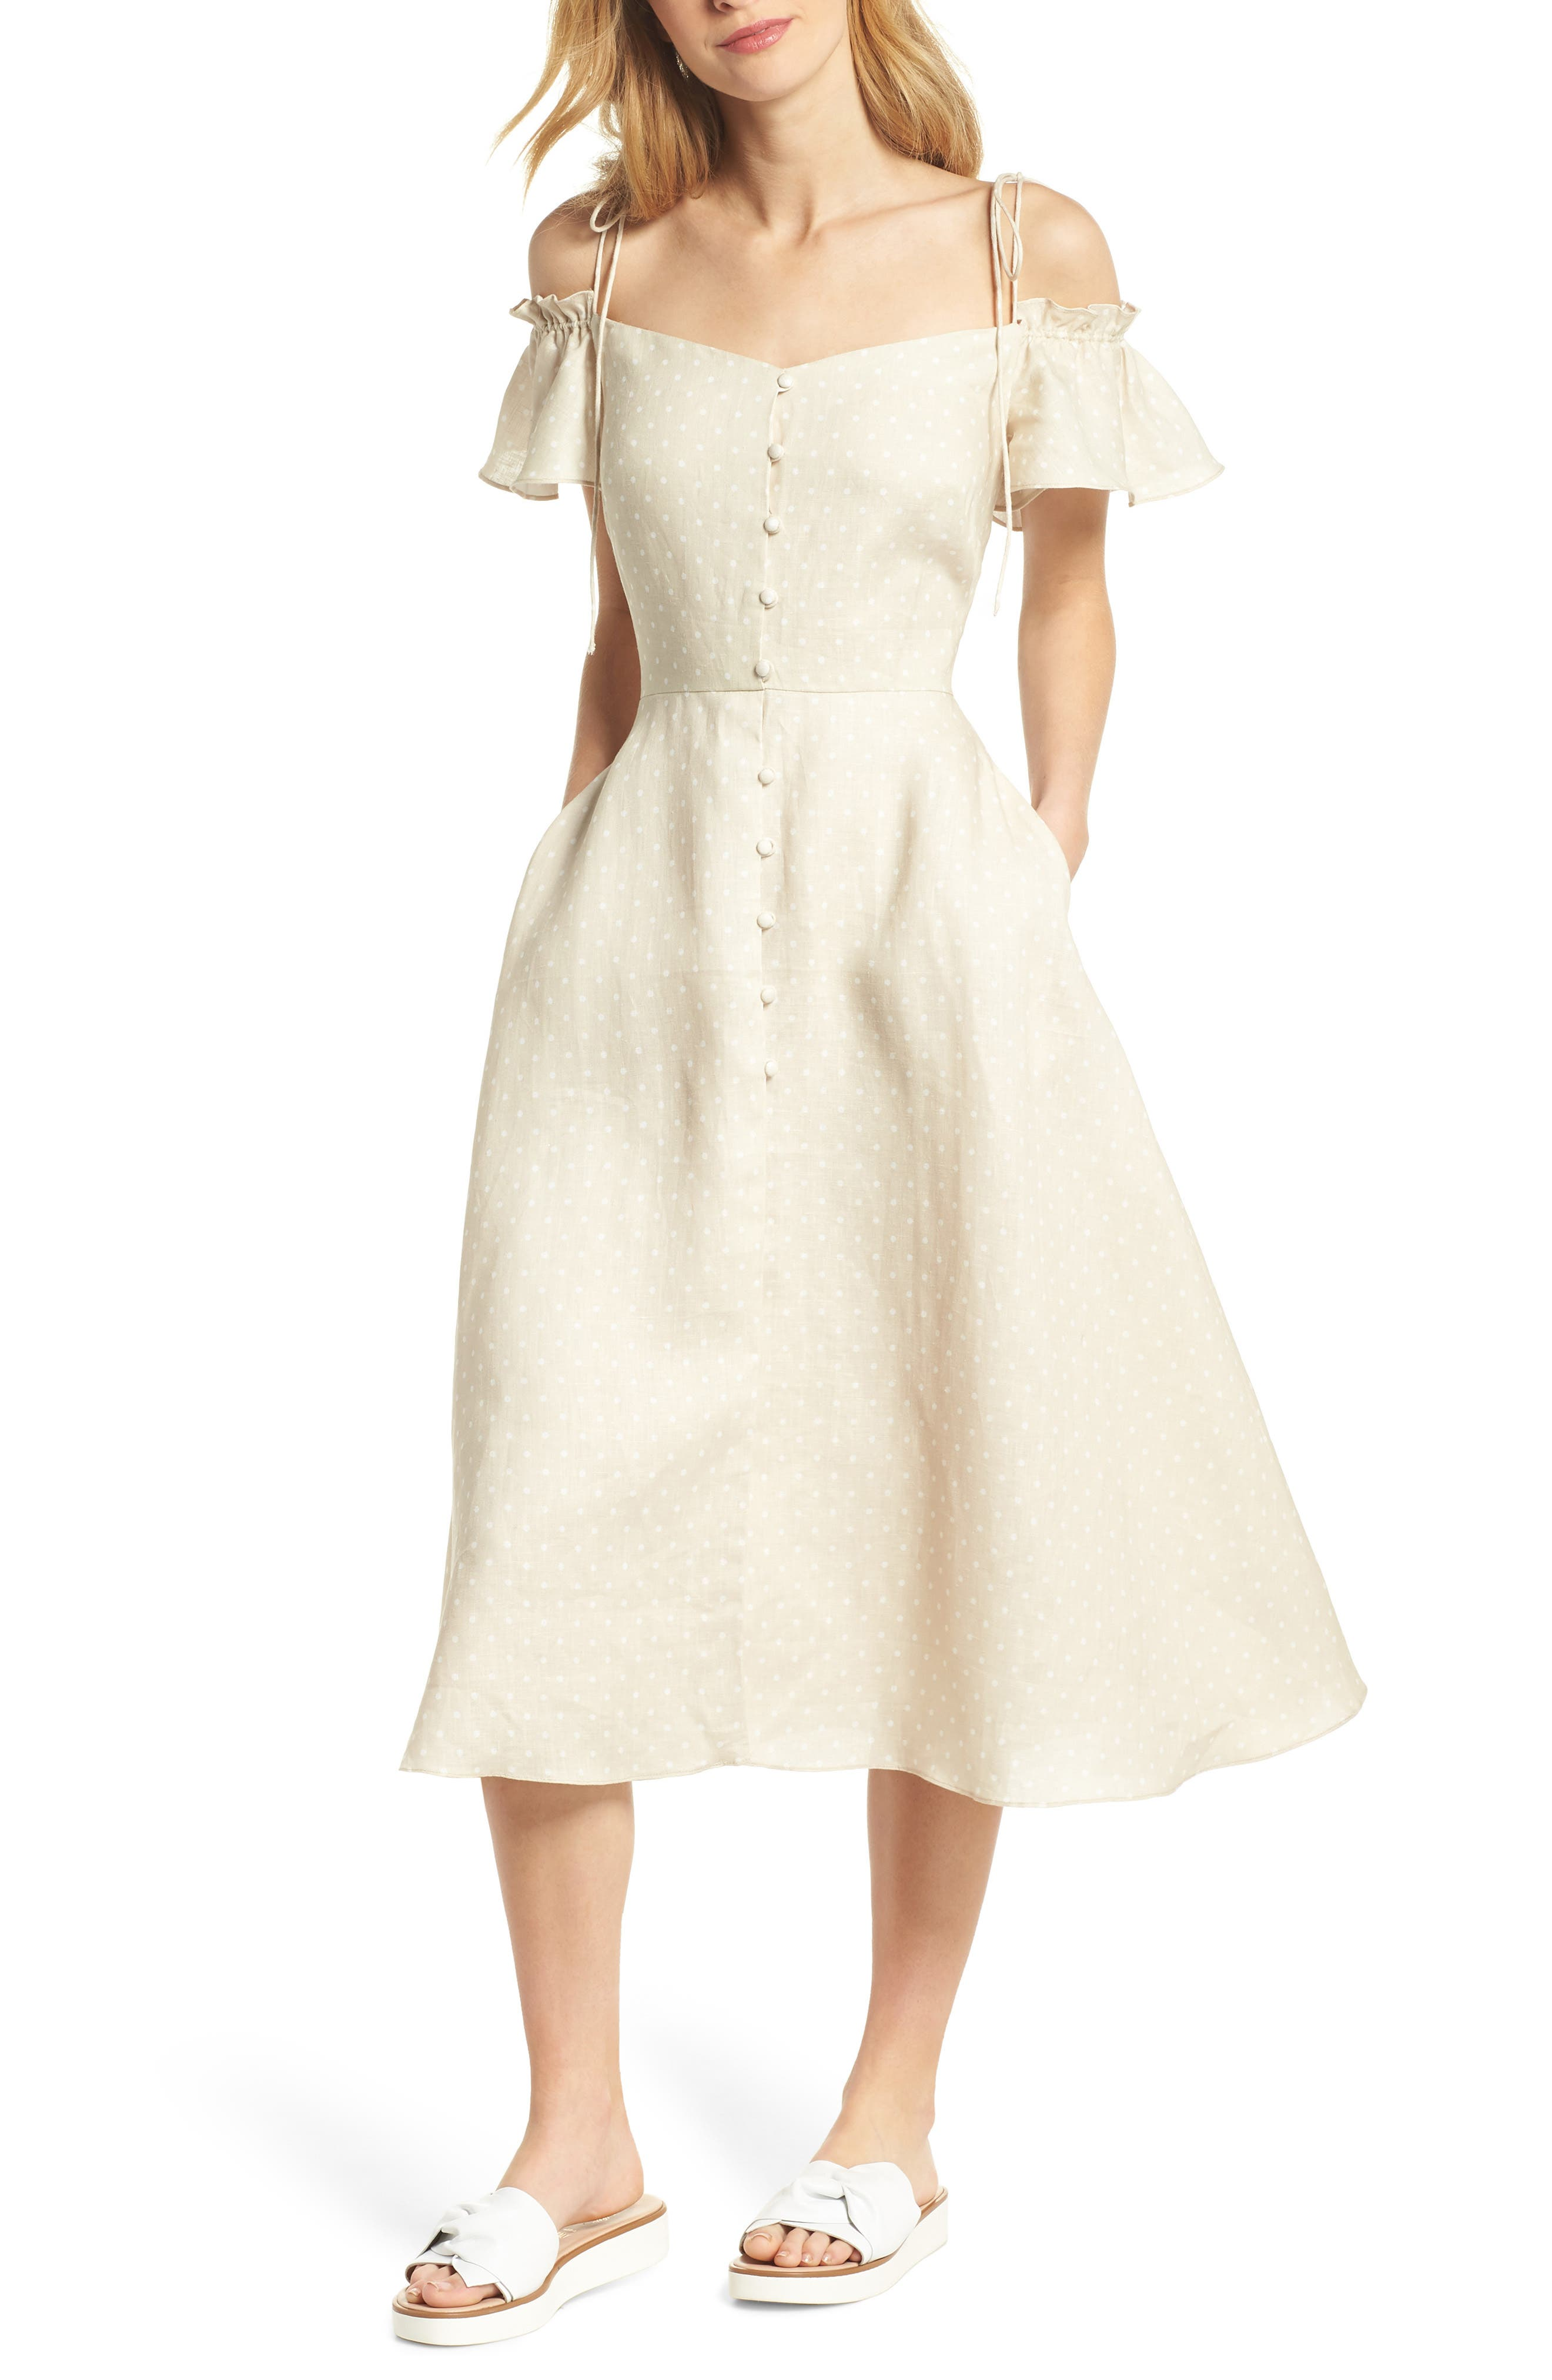 Colleen Polka Dot Off the Shoulder Dress,                         Main,                         color, Cream/ Ecru